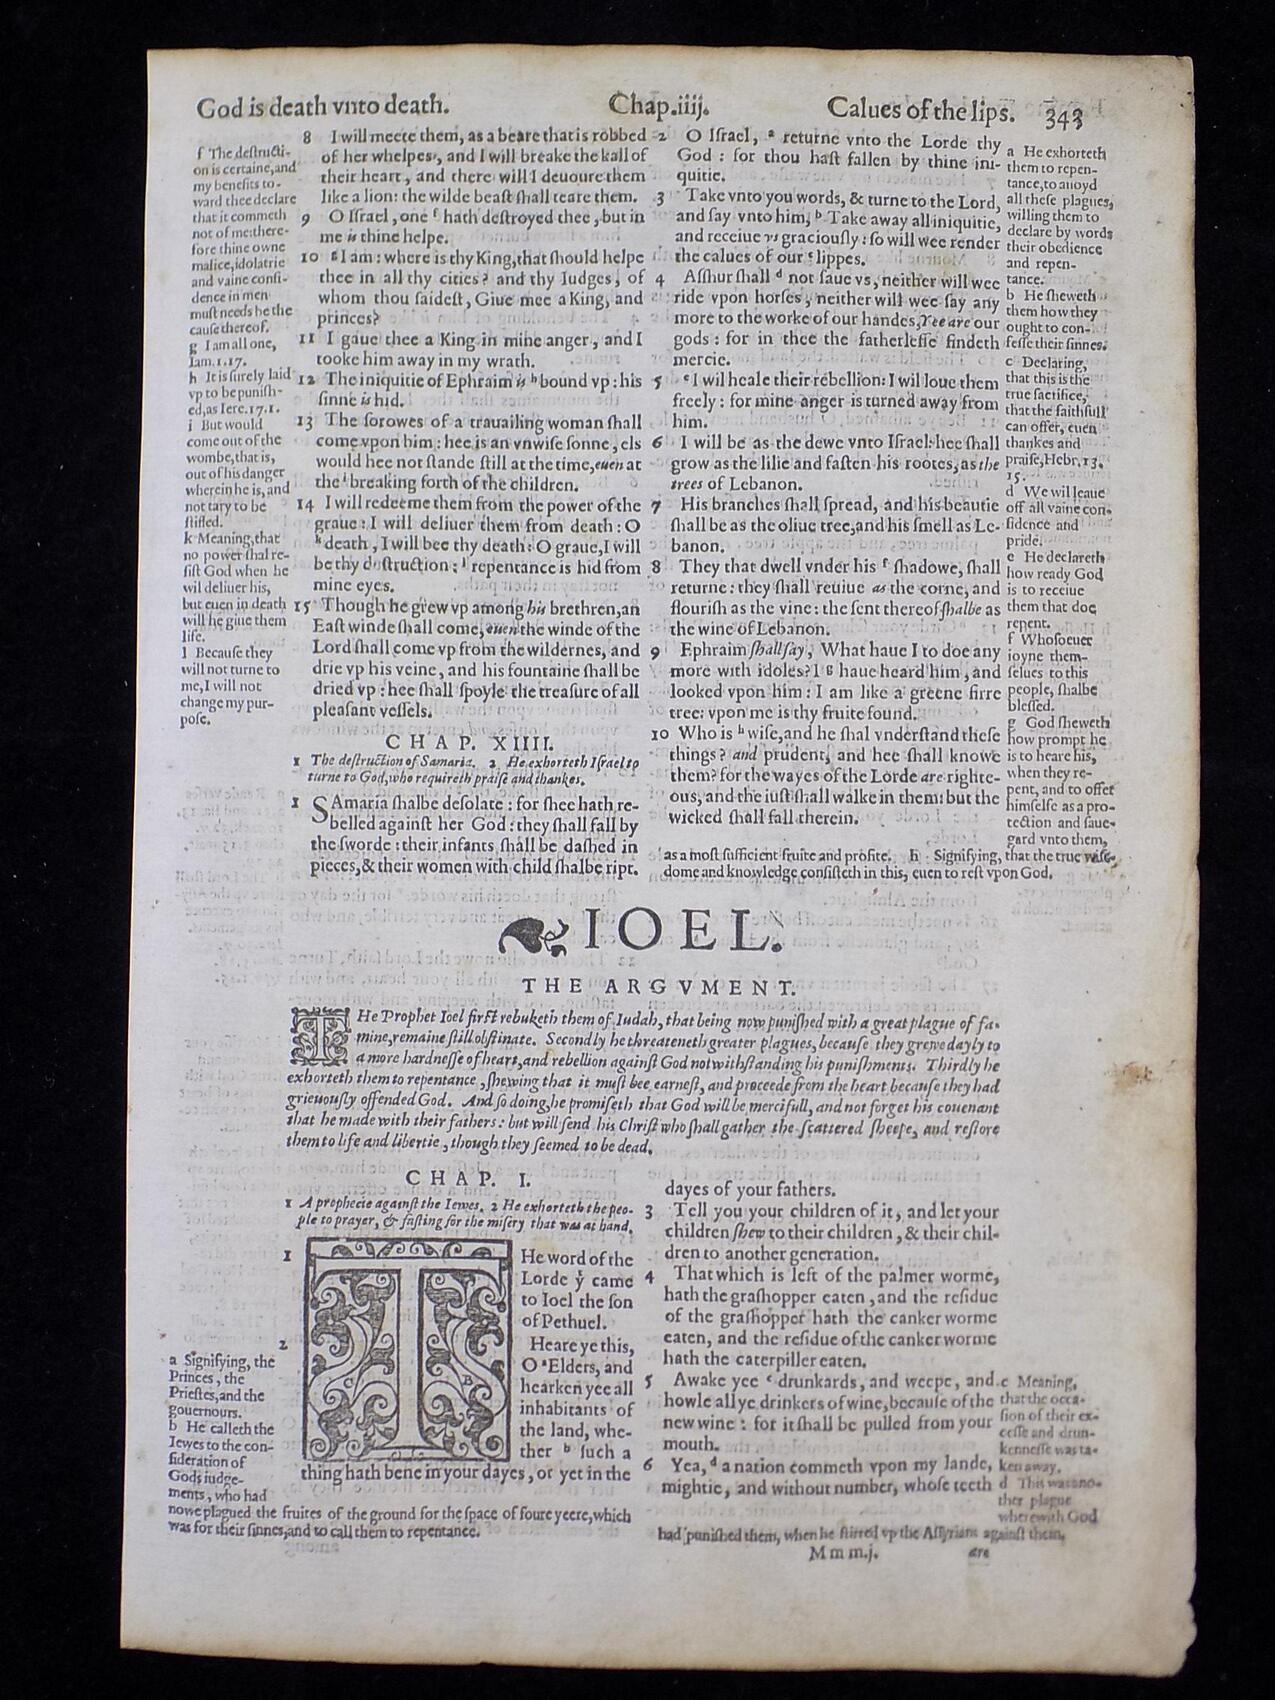 Geneva Bible Leaves Authentic Elizabethan Era